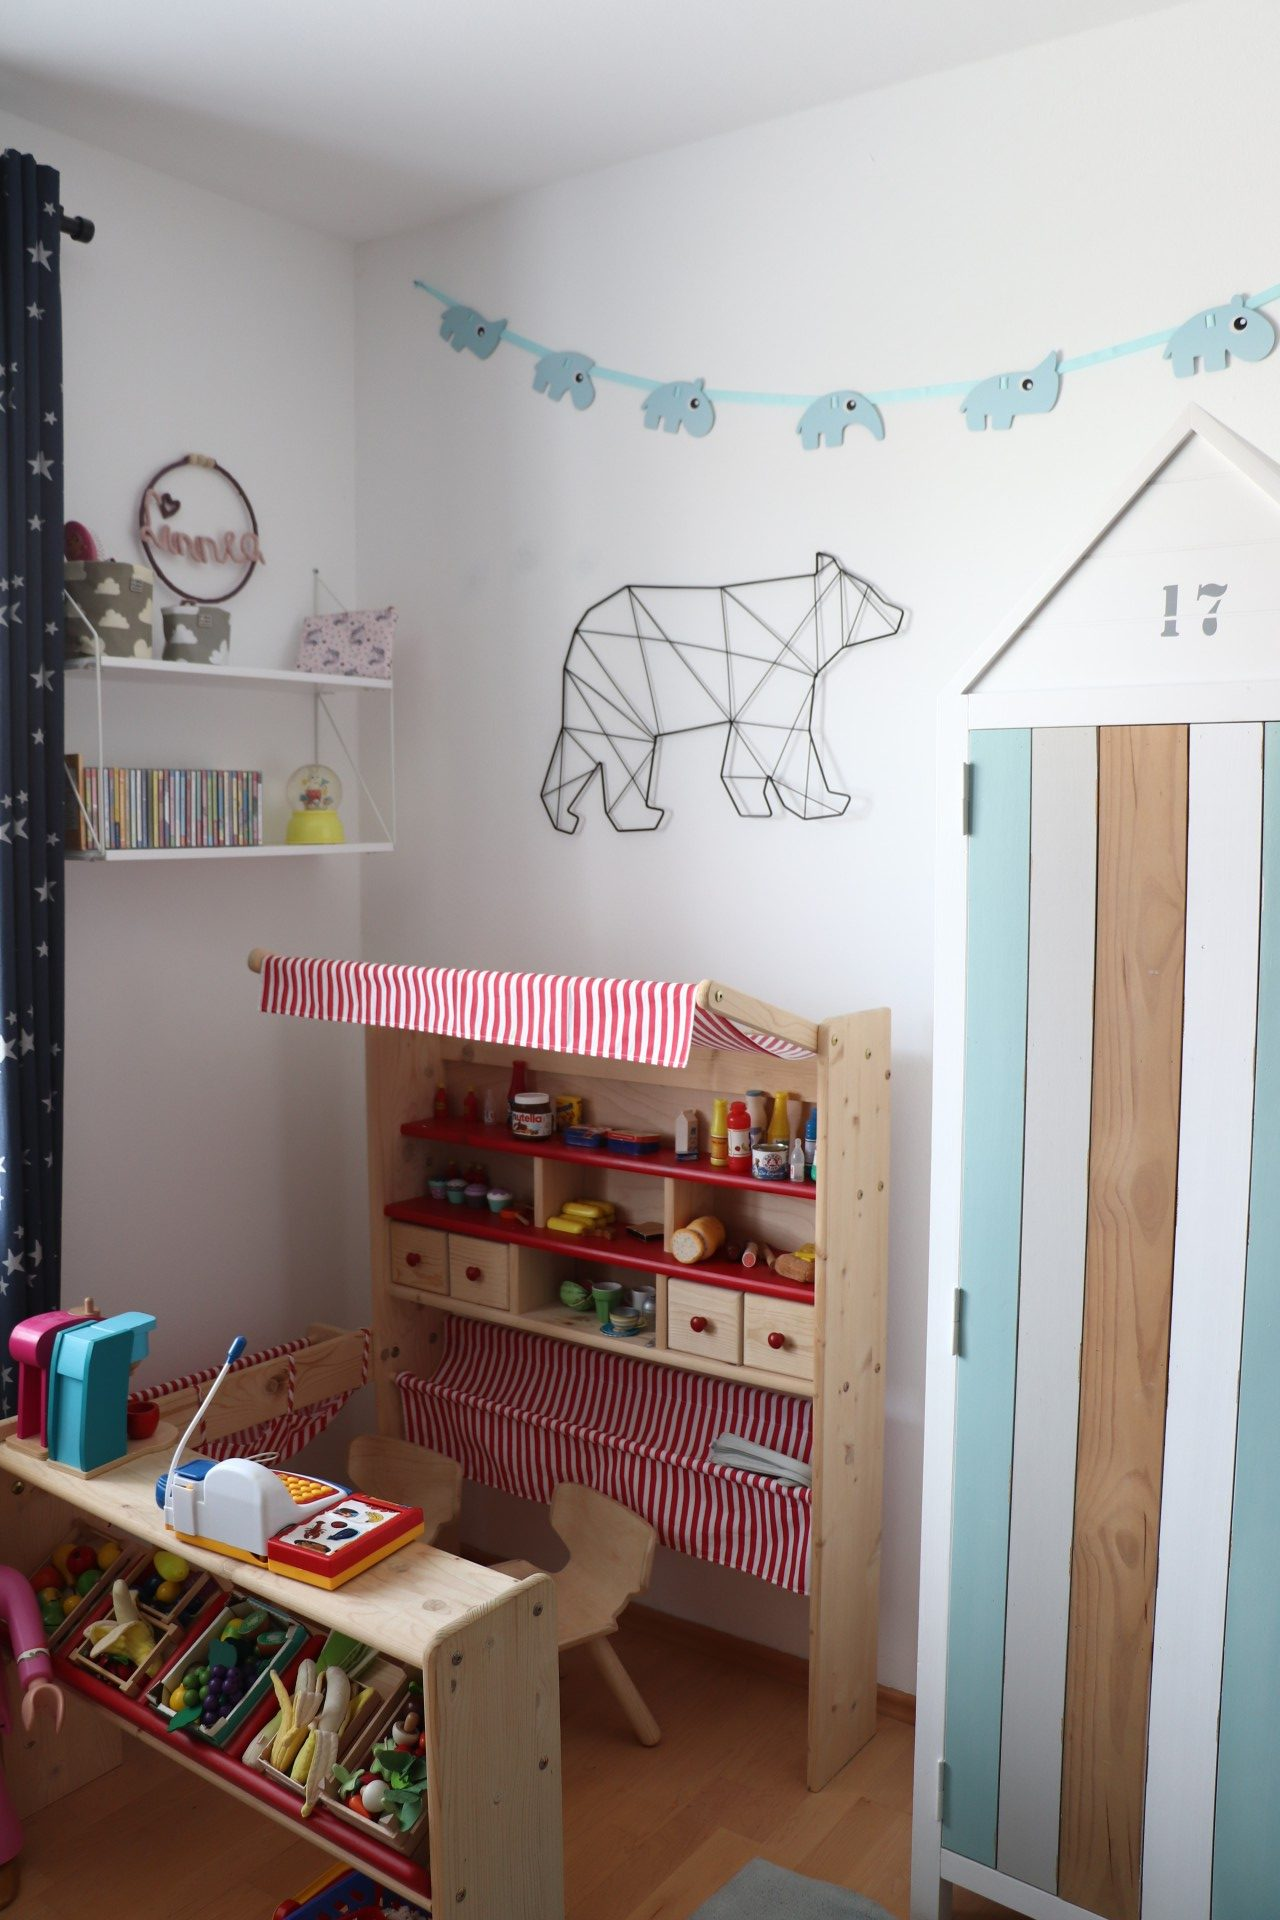 Full Size of Wanddeko Kinderzimmer Ideen Lavendelblog Sofa Regal Regale Küche Weiß Kinderzimmer Kinderzimmer Wanddeko